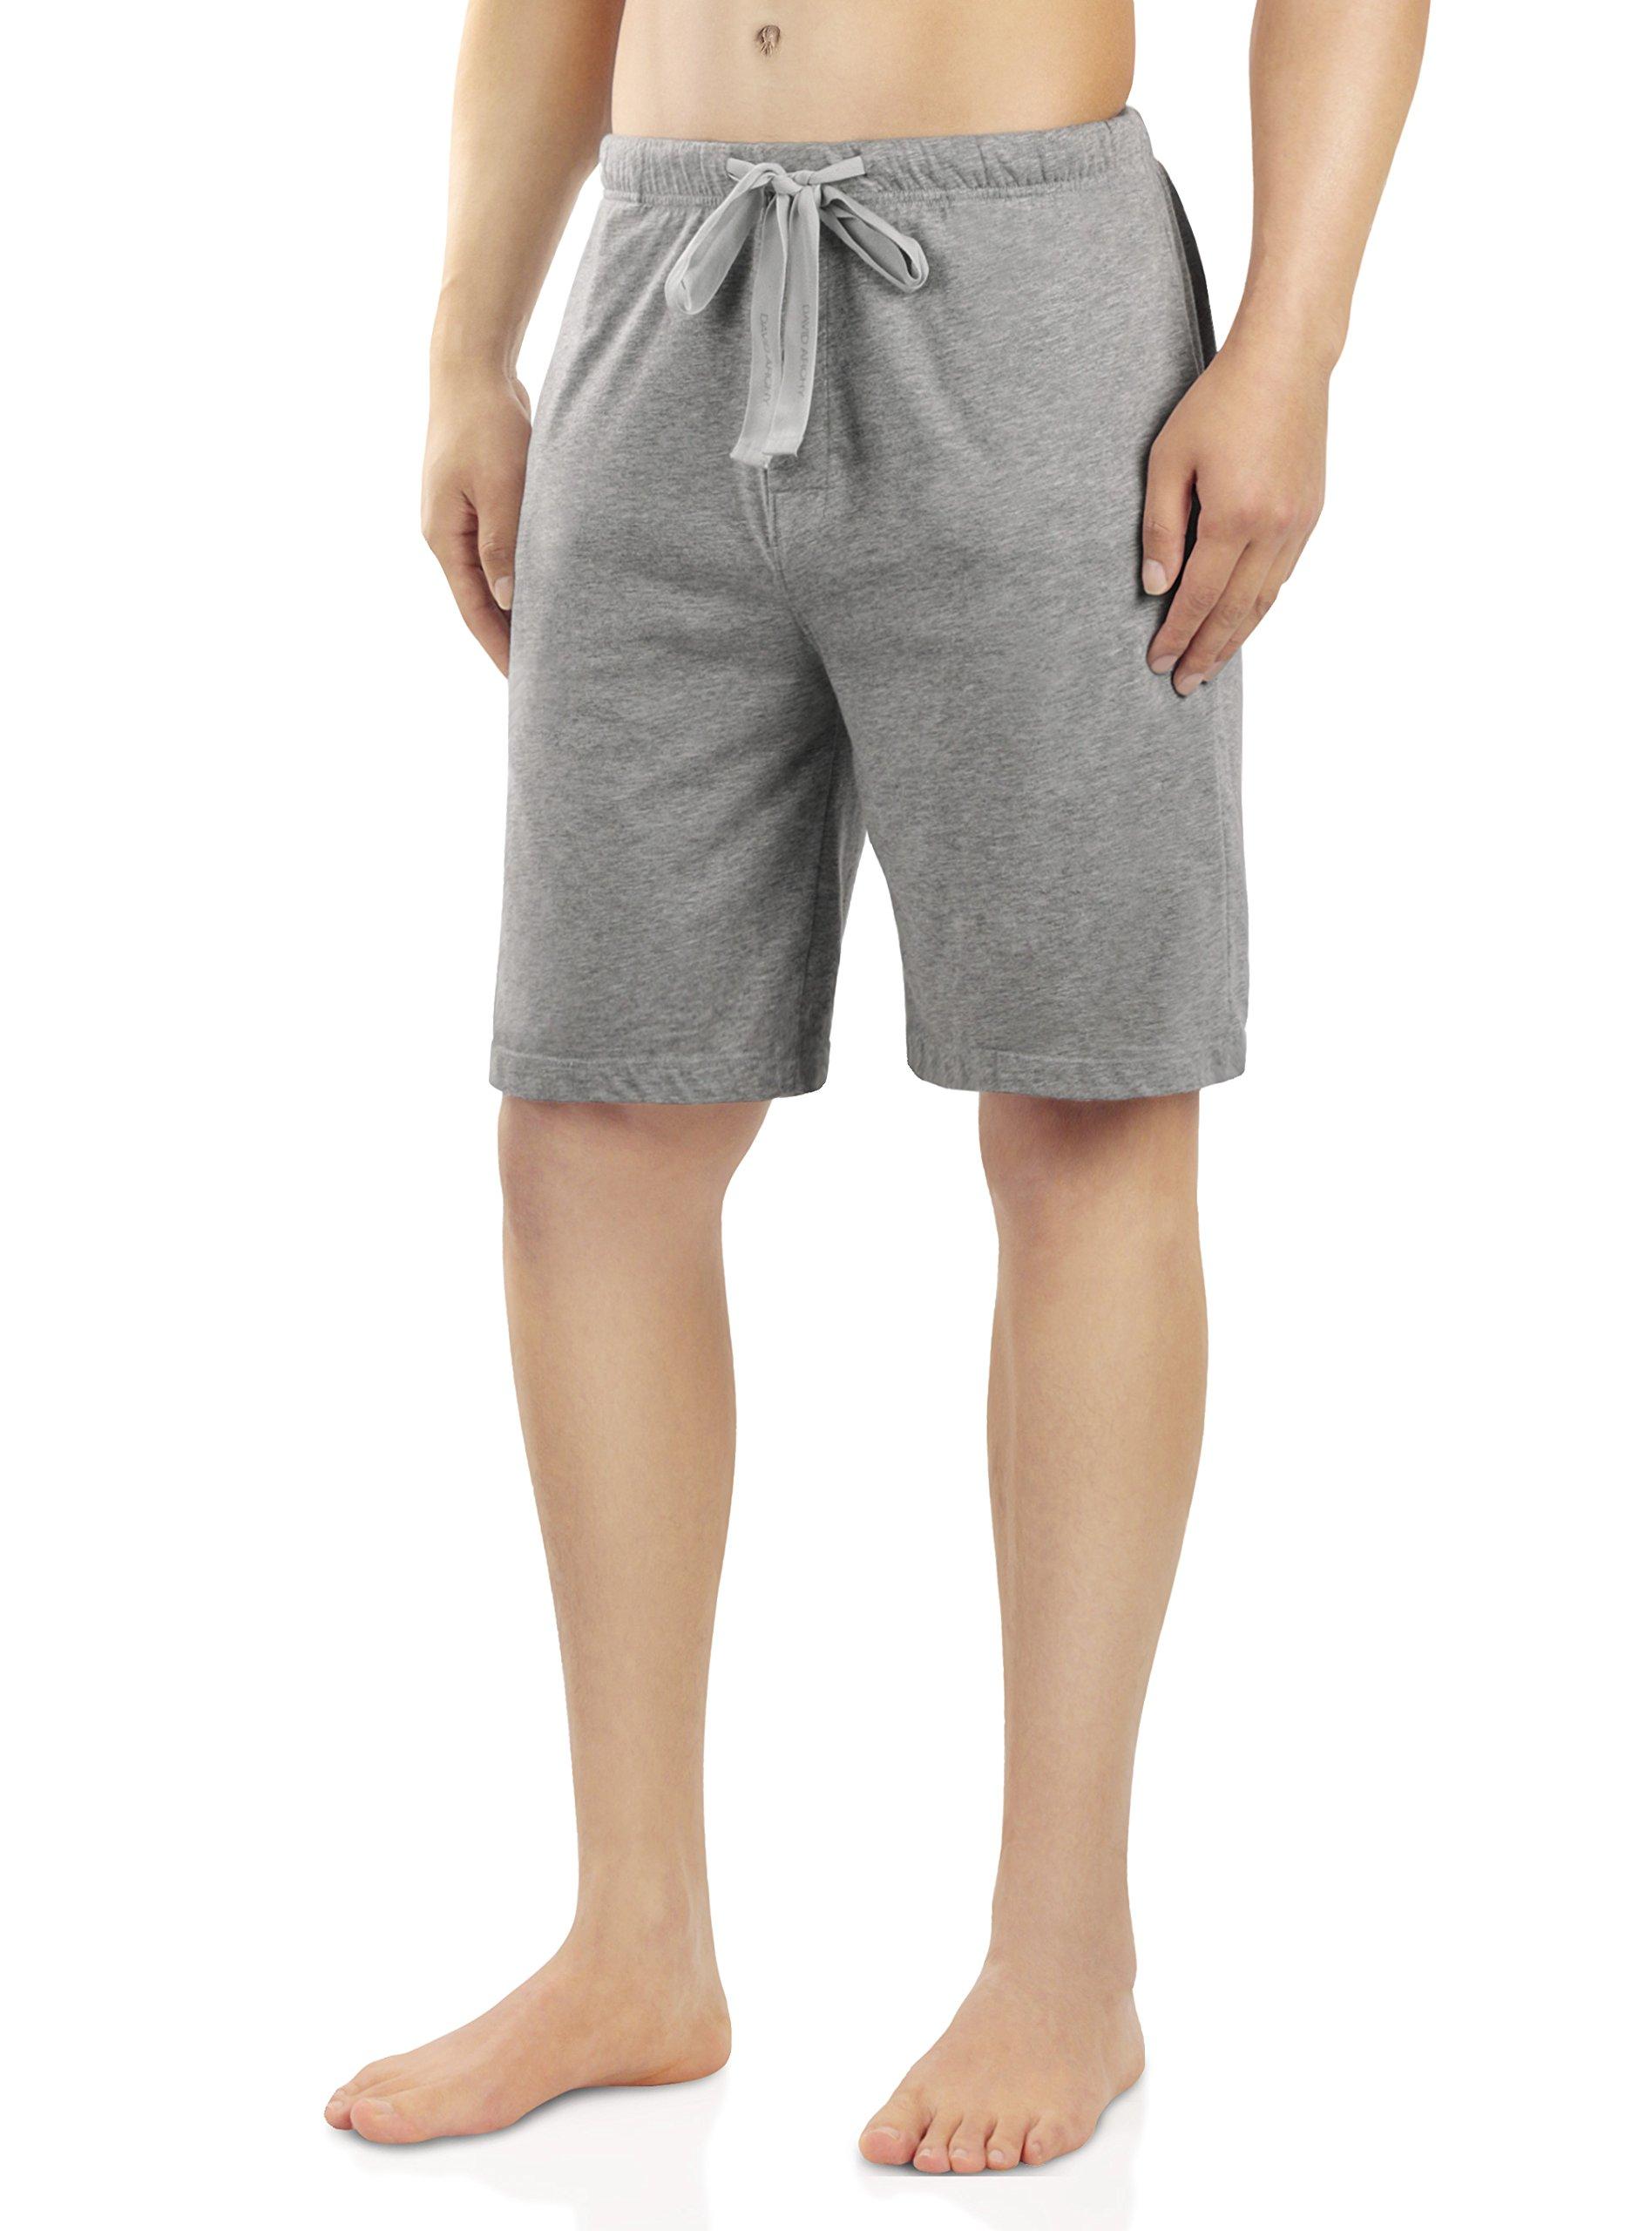 David Archy Men's Soft Comfy Cotton Sleep Short Lounge Short Pants (Heather Dark Gray, L) by David Archy